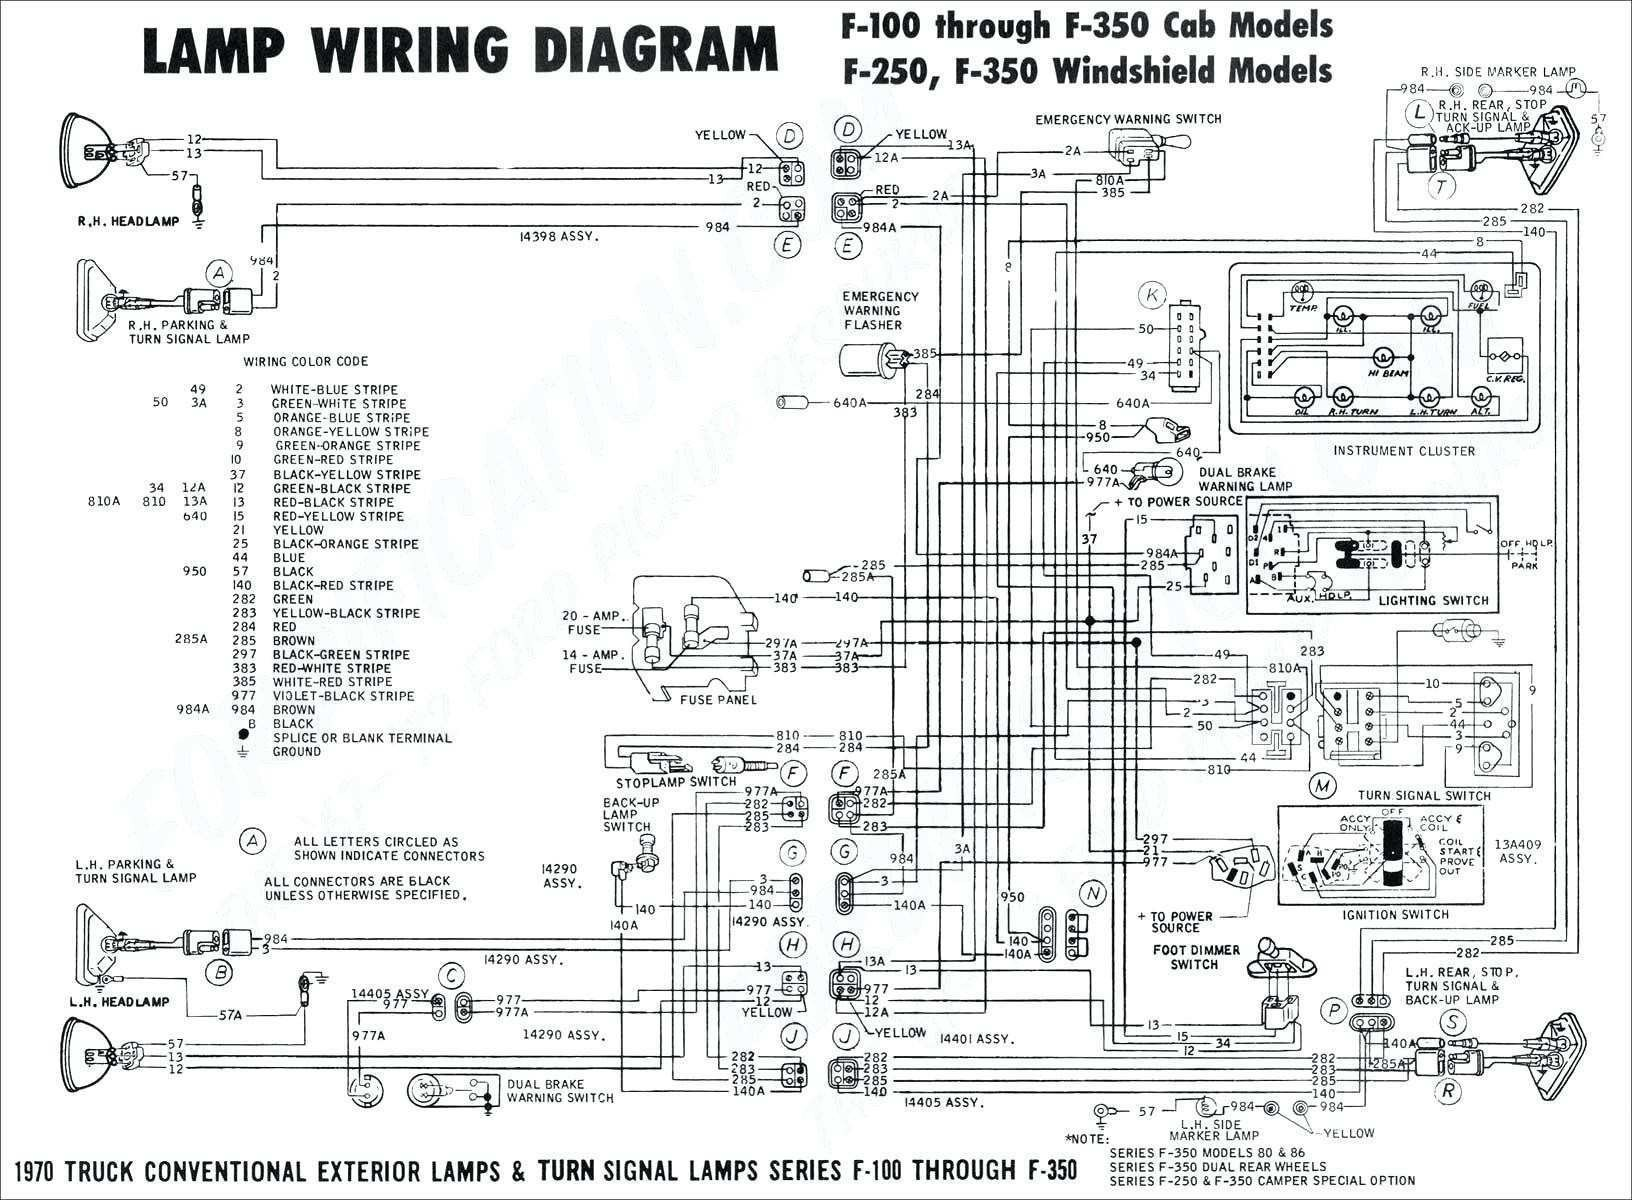 Brake Light Wiring Diagram 1994 Gmc Sierra Wiring Diagram for Fesler Led Tail Light Wiring Diagram Of Brake Light Wiring Diagram 1994 Gmc Sierra